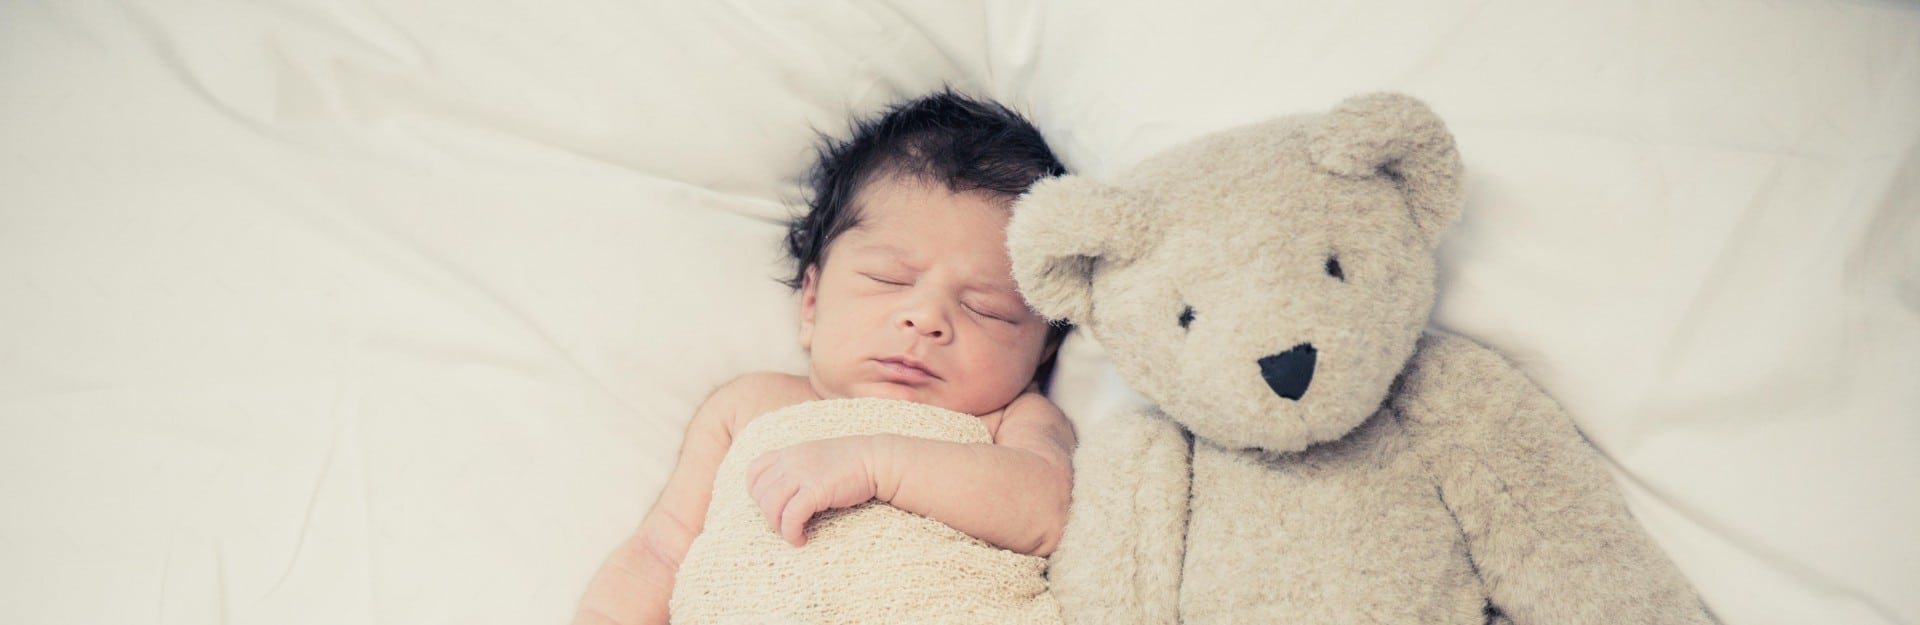 Newborn Photography, San Antonio Newborn Photography, Newborn Photos, San Antonio Newborn Photographer, Newborn Photographer